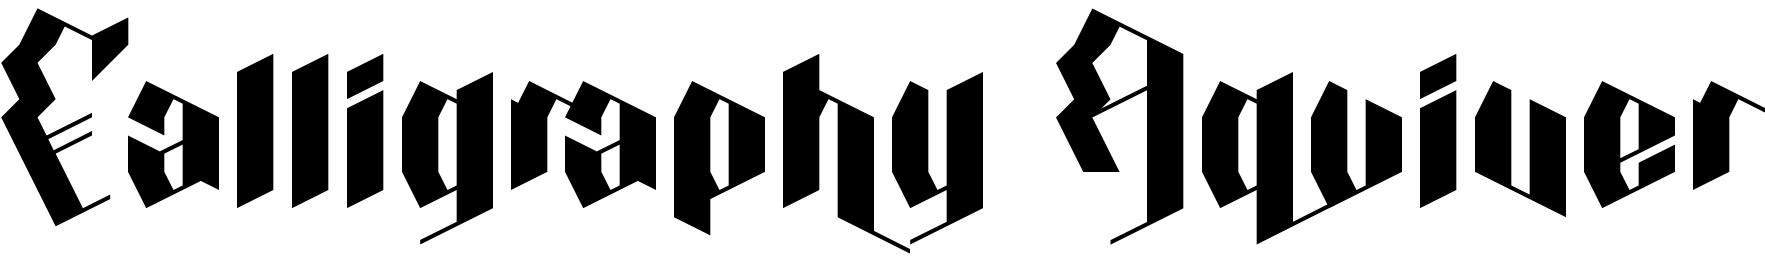 Calligraphy Aquiver